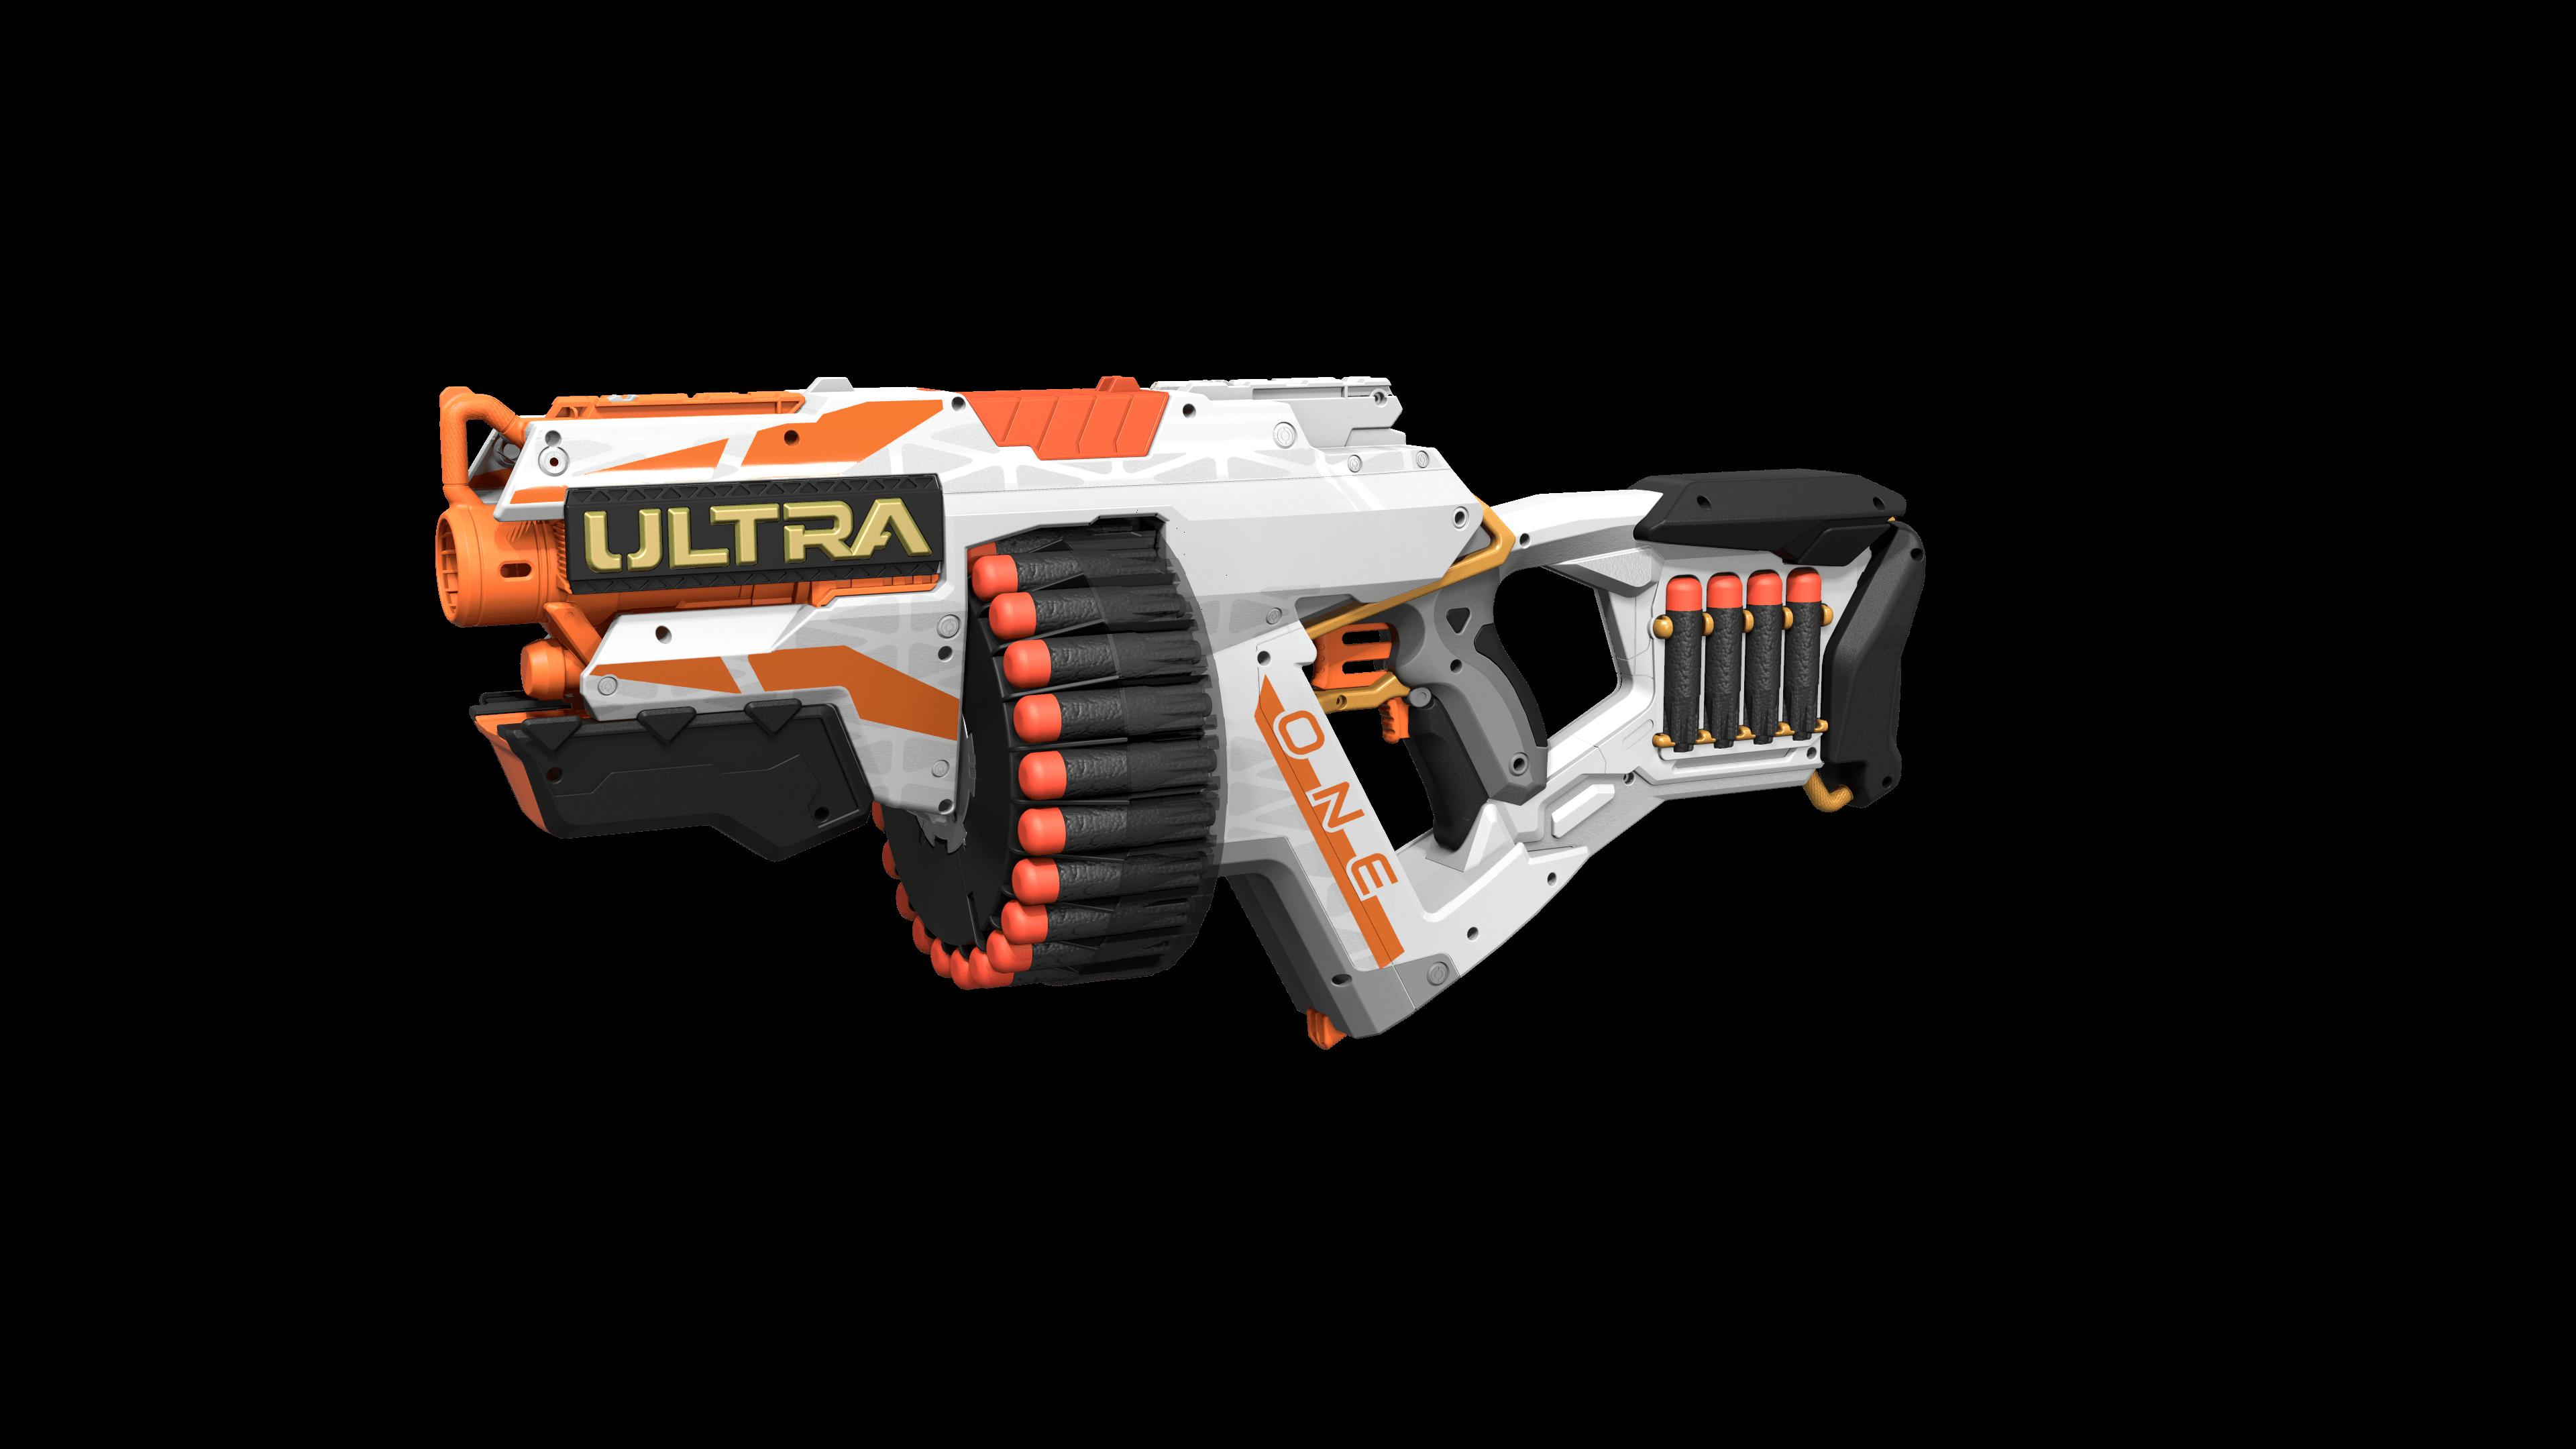 ultra blaster img 70